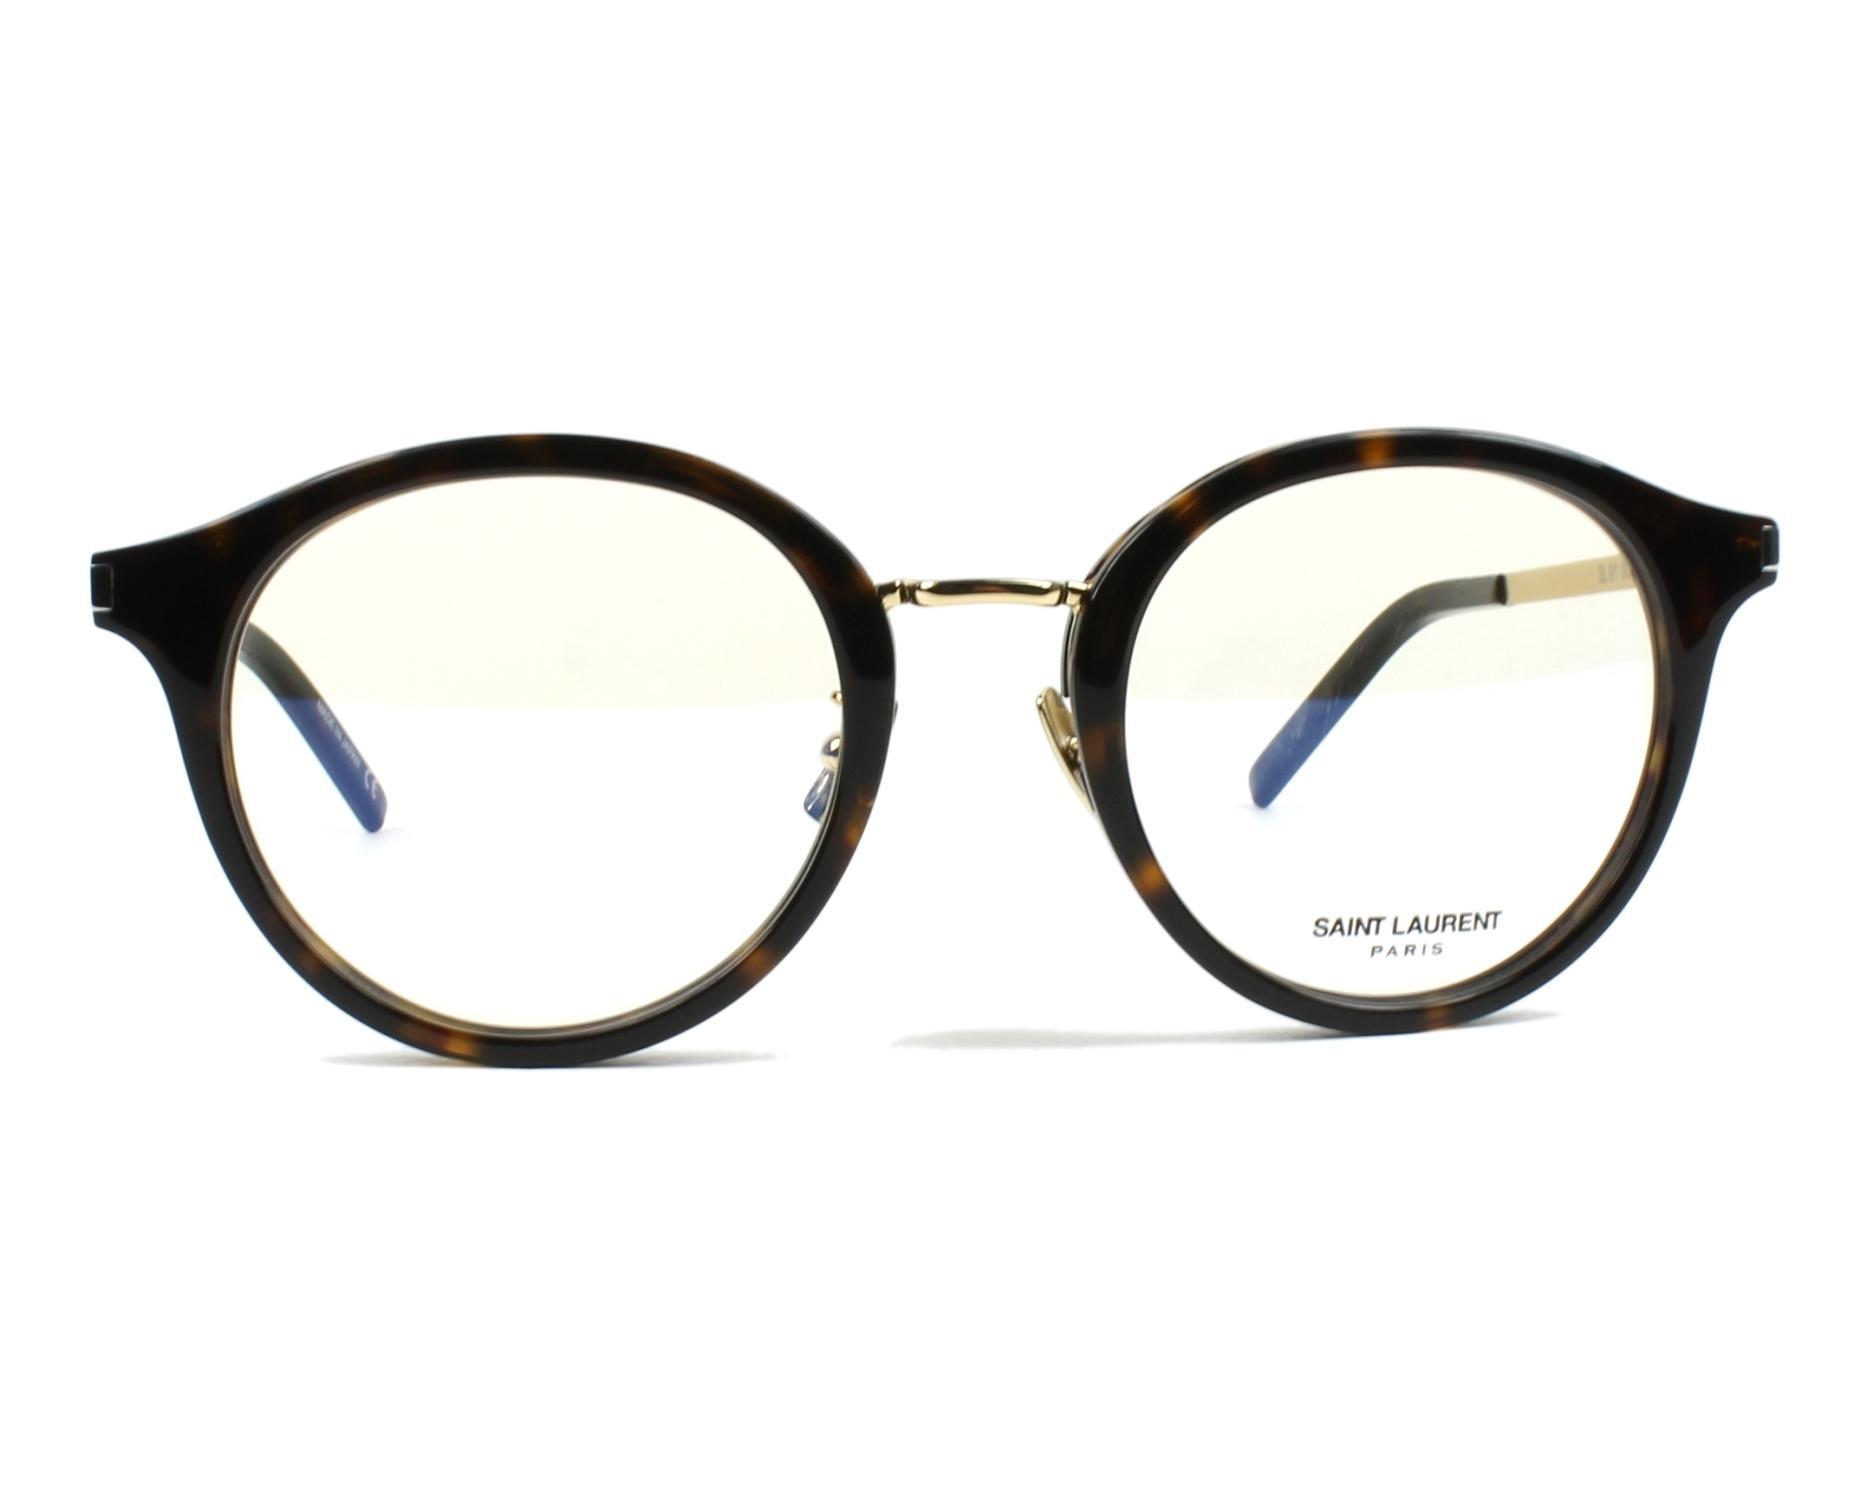 a467c6afe9 eyeglasses Yves Saint Laurent SL-91 007 49-21 Havana Gold front view